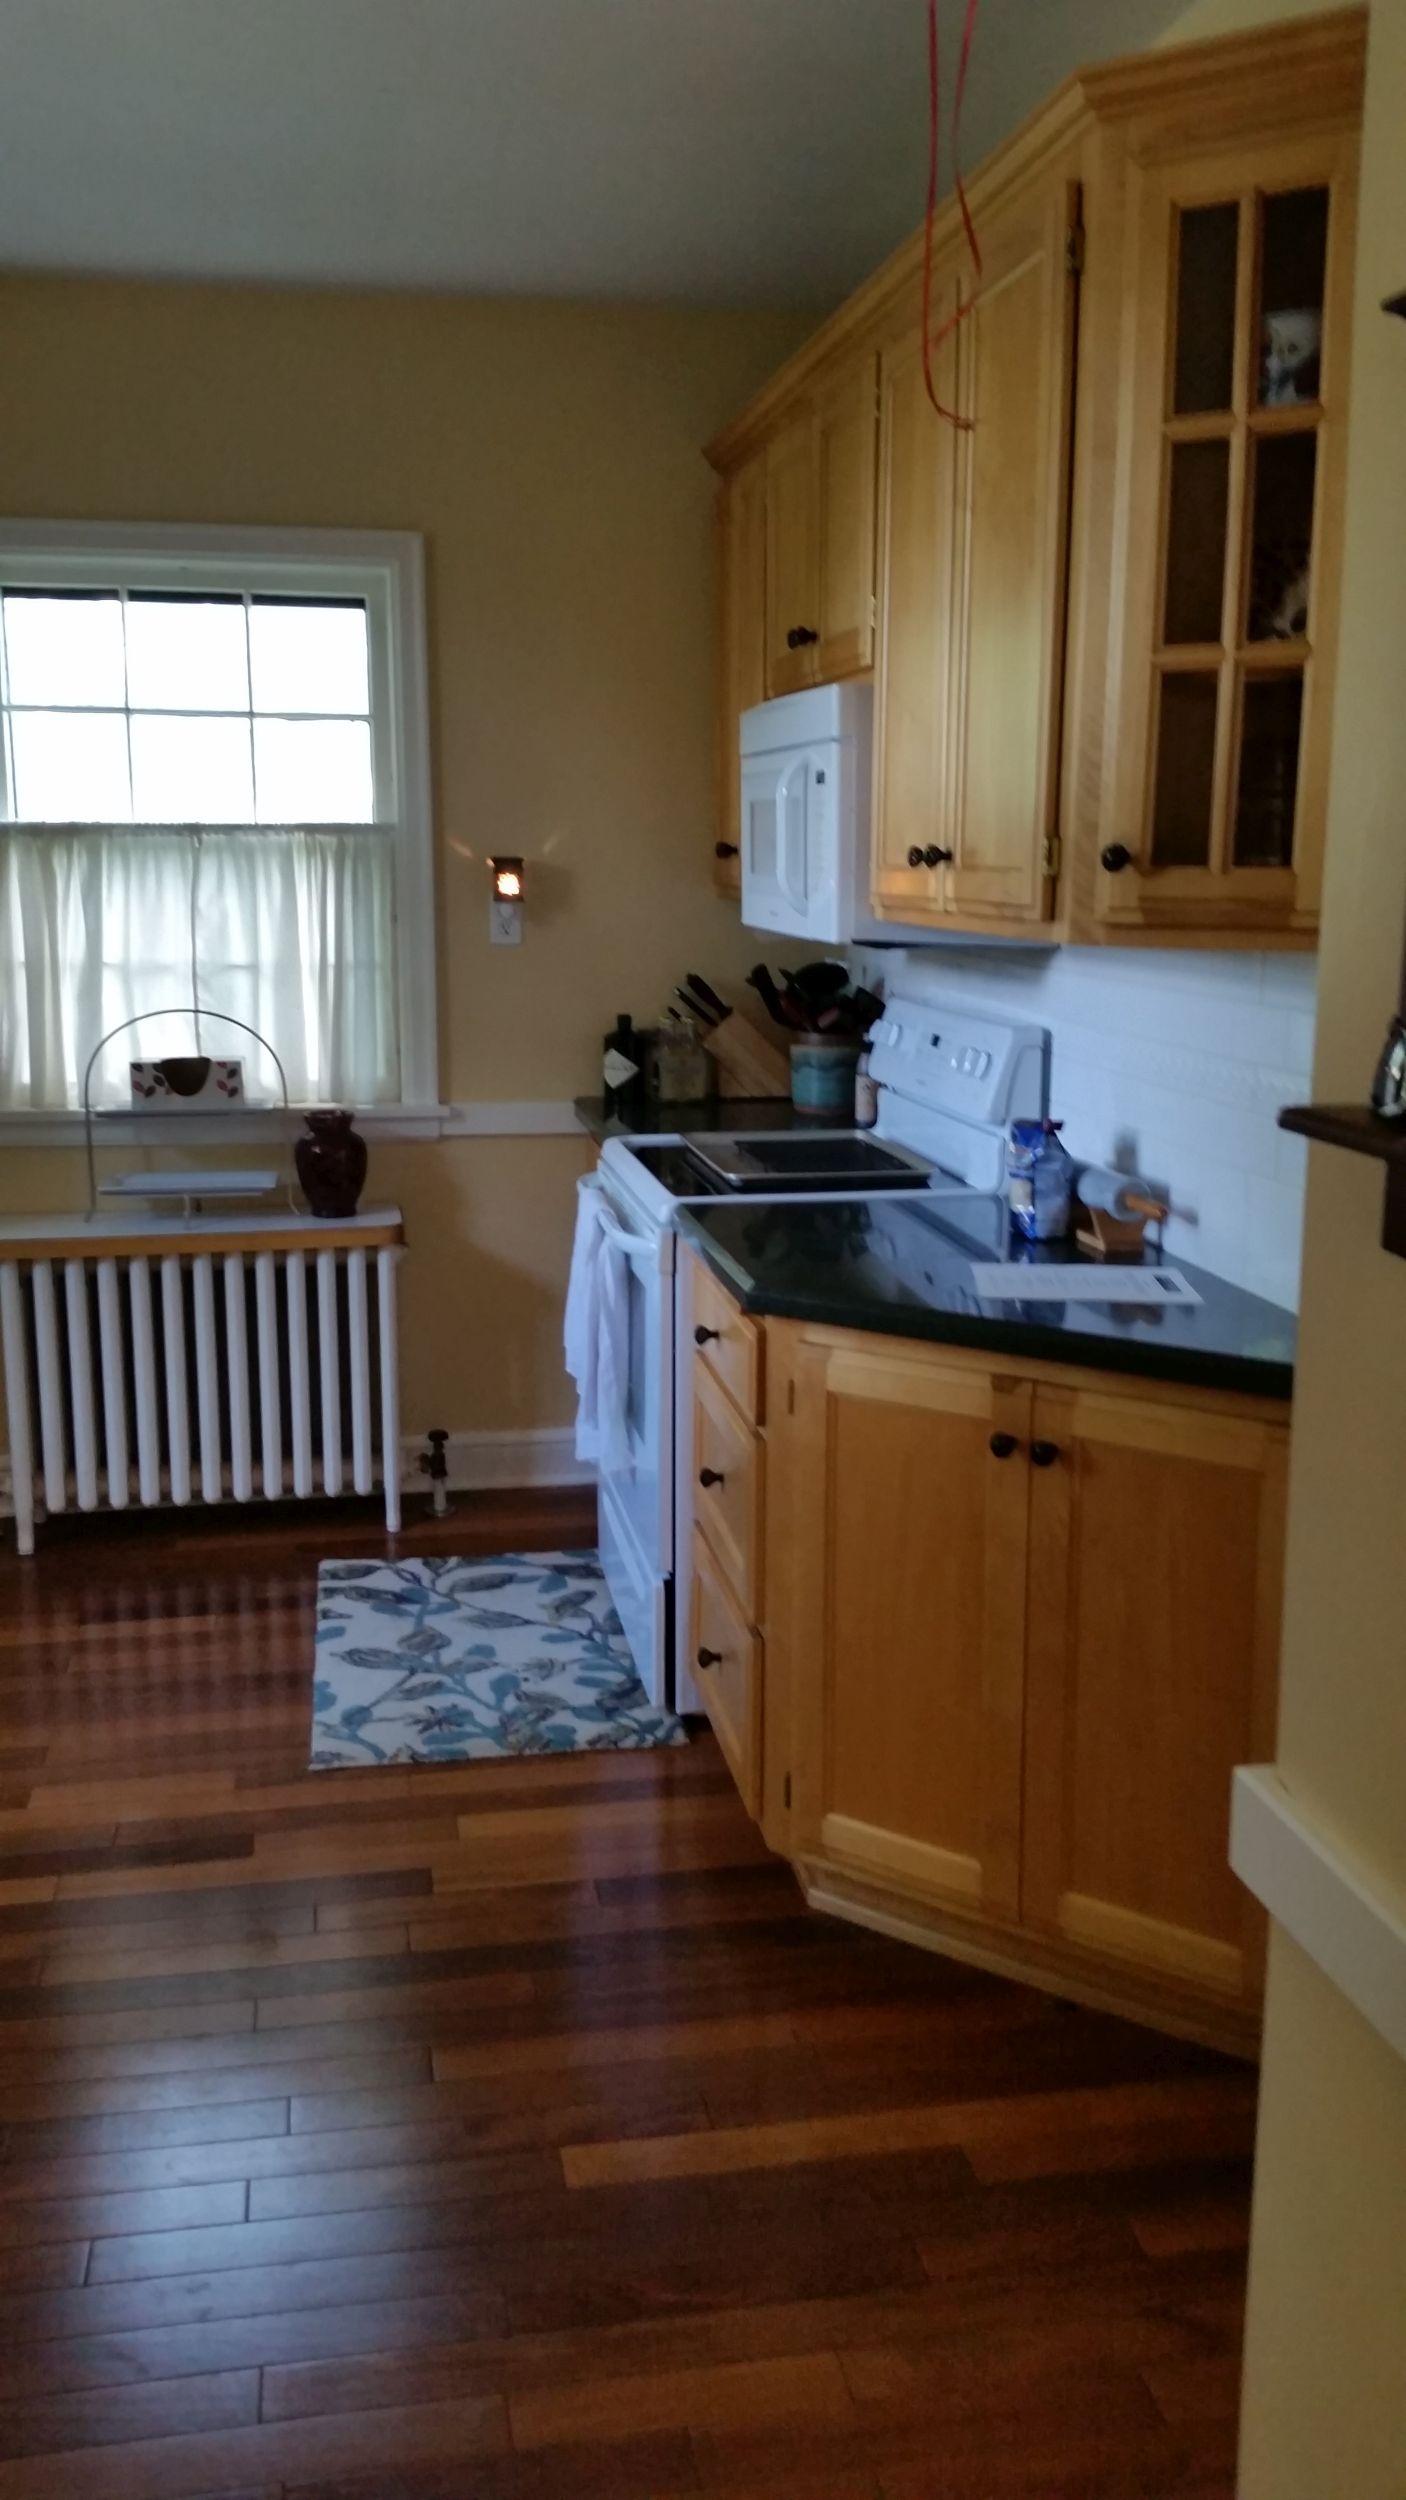 luverne_kitchen_before_10.jpg